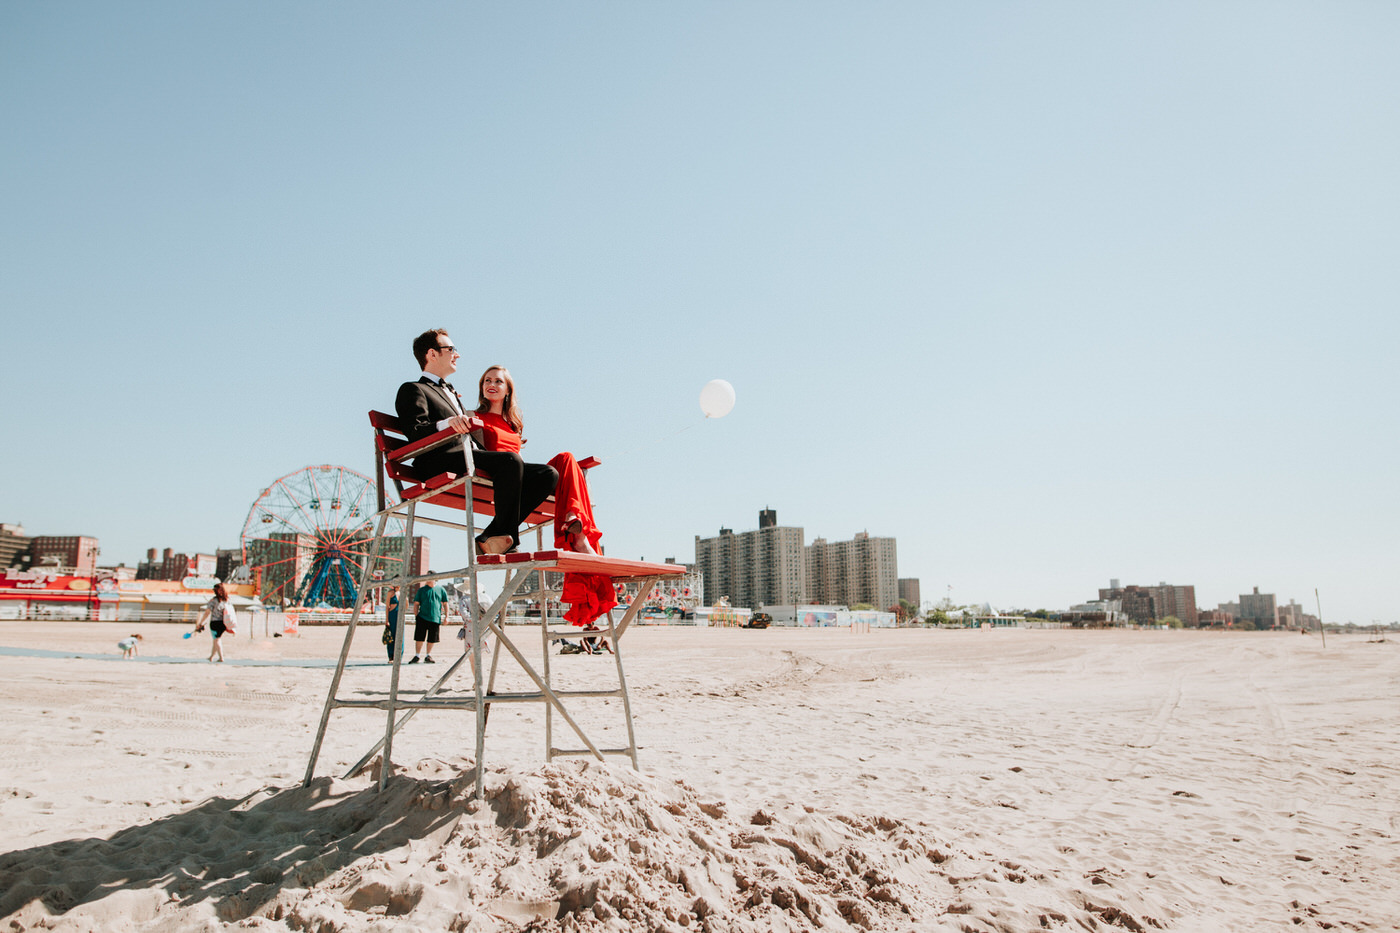 Coney Island Engagement - Diana Ascarrrunz Photography -158.jpg